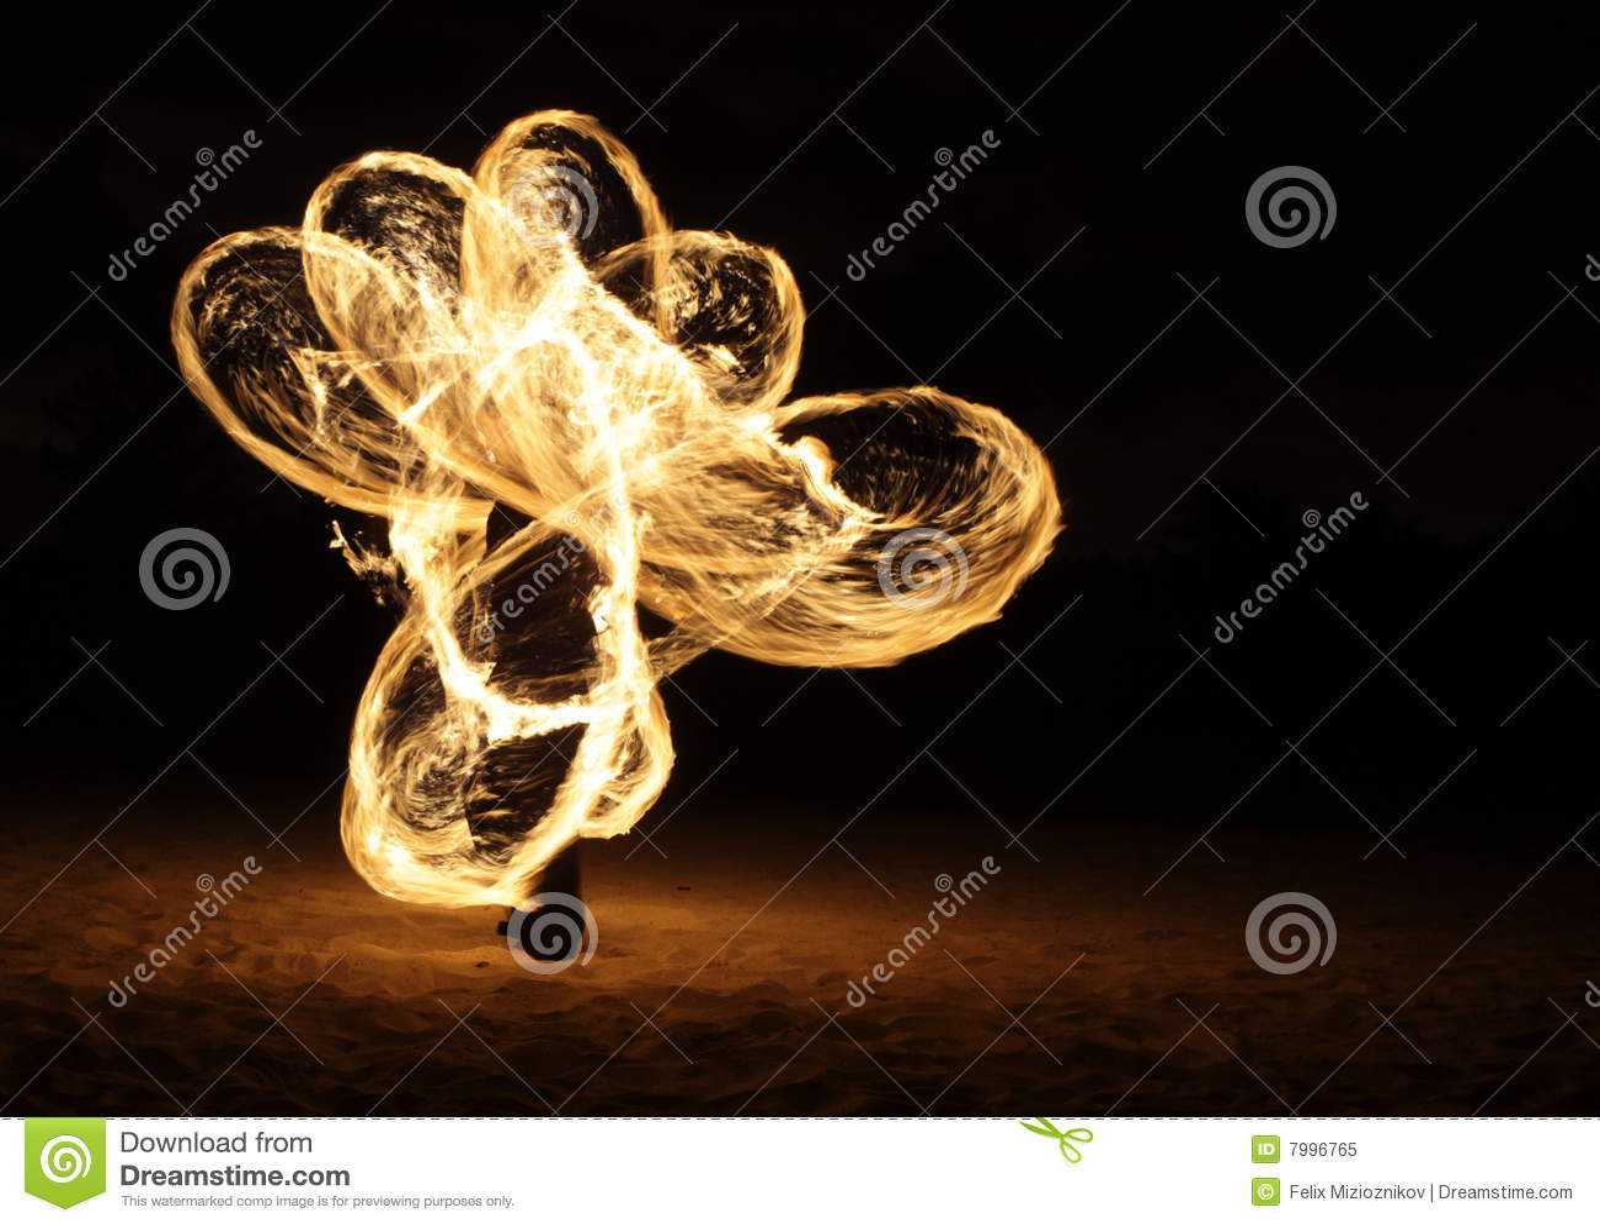 Fire Dancer in the dark